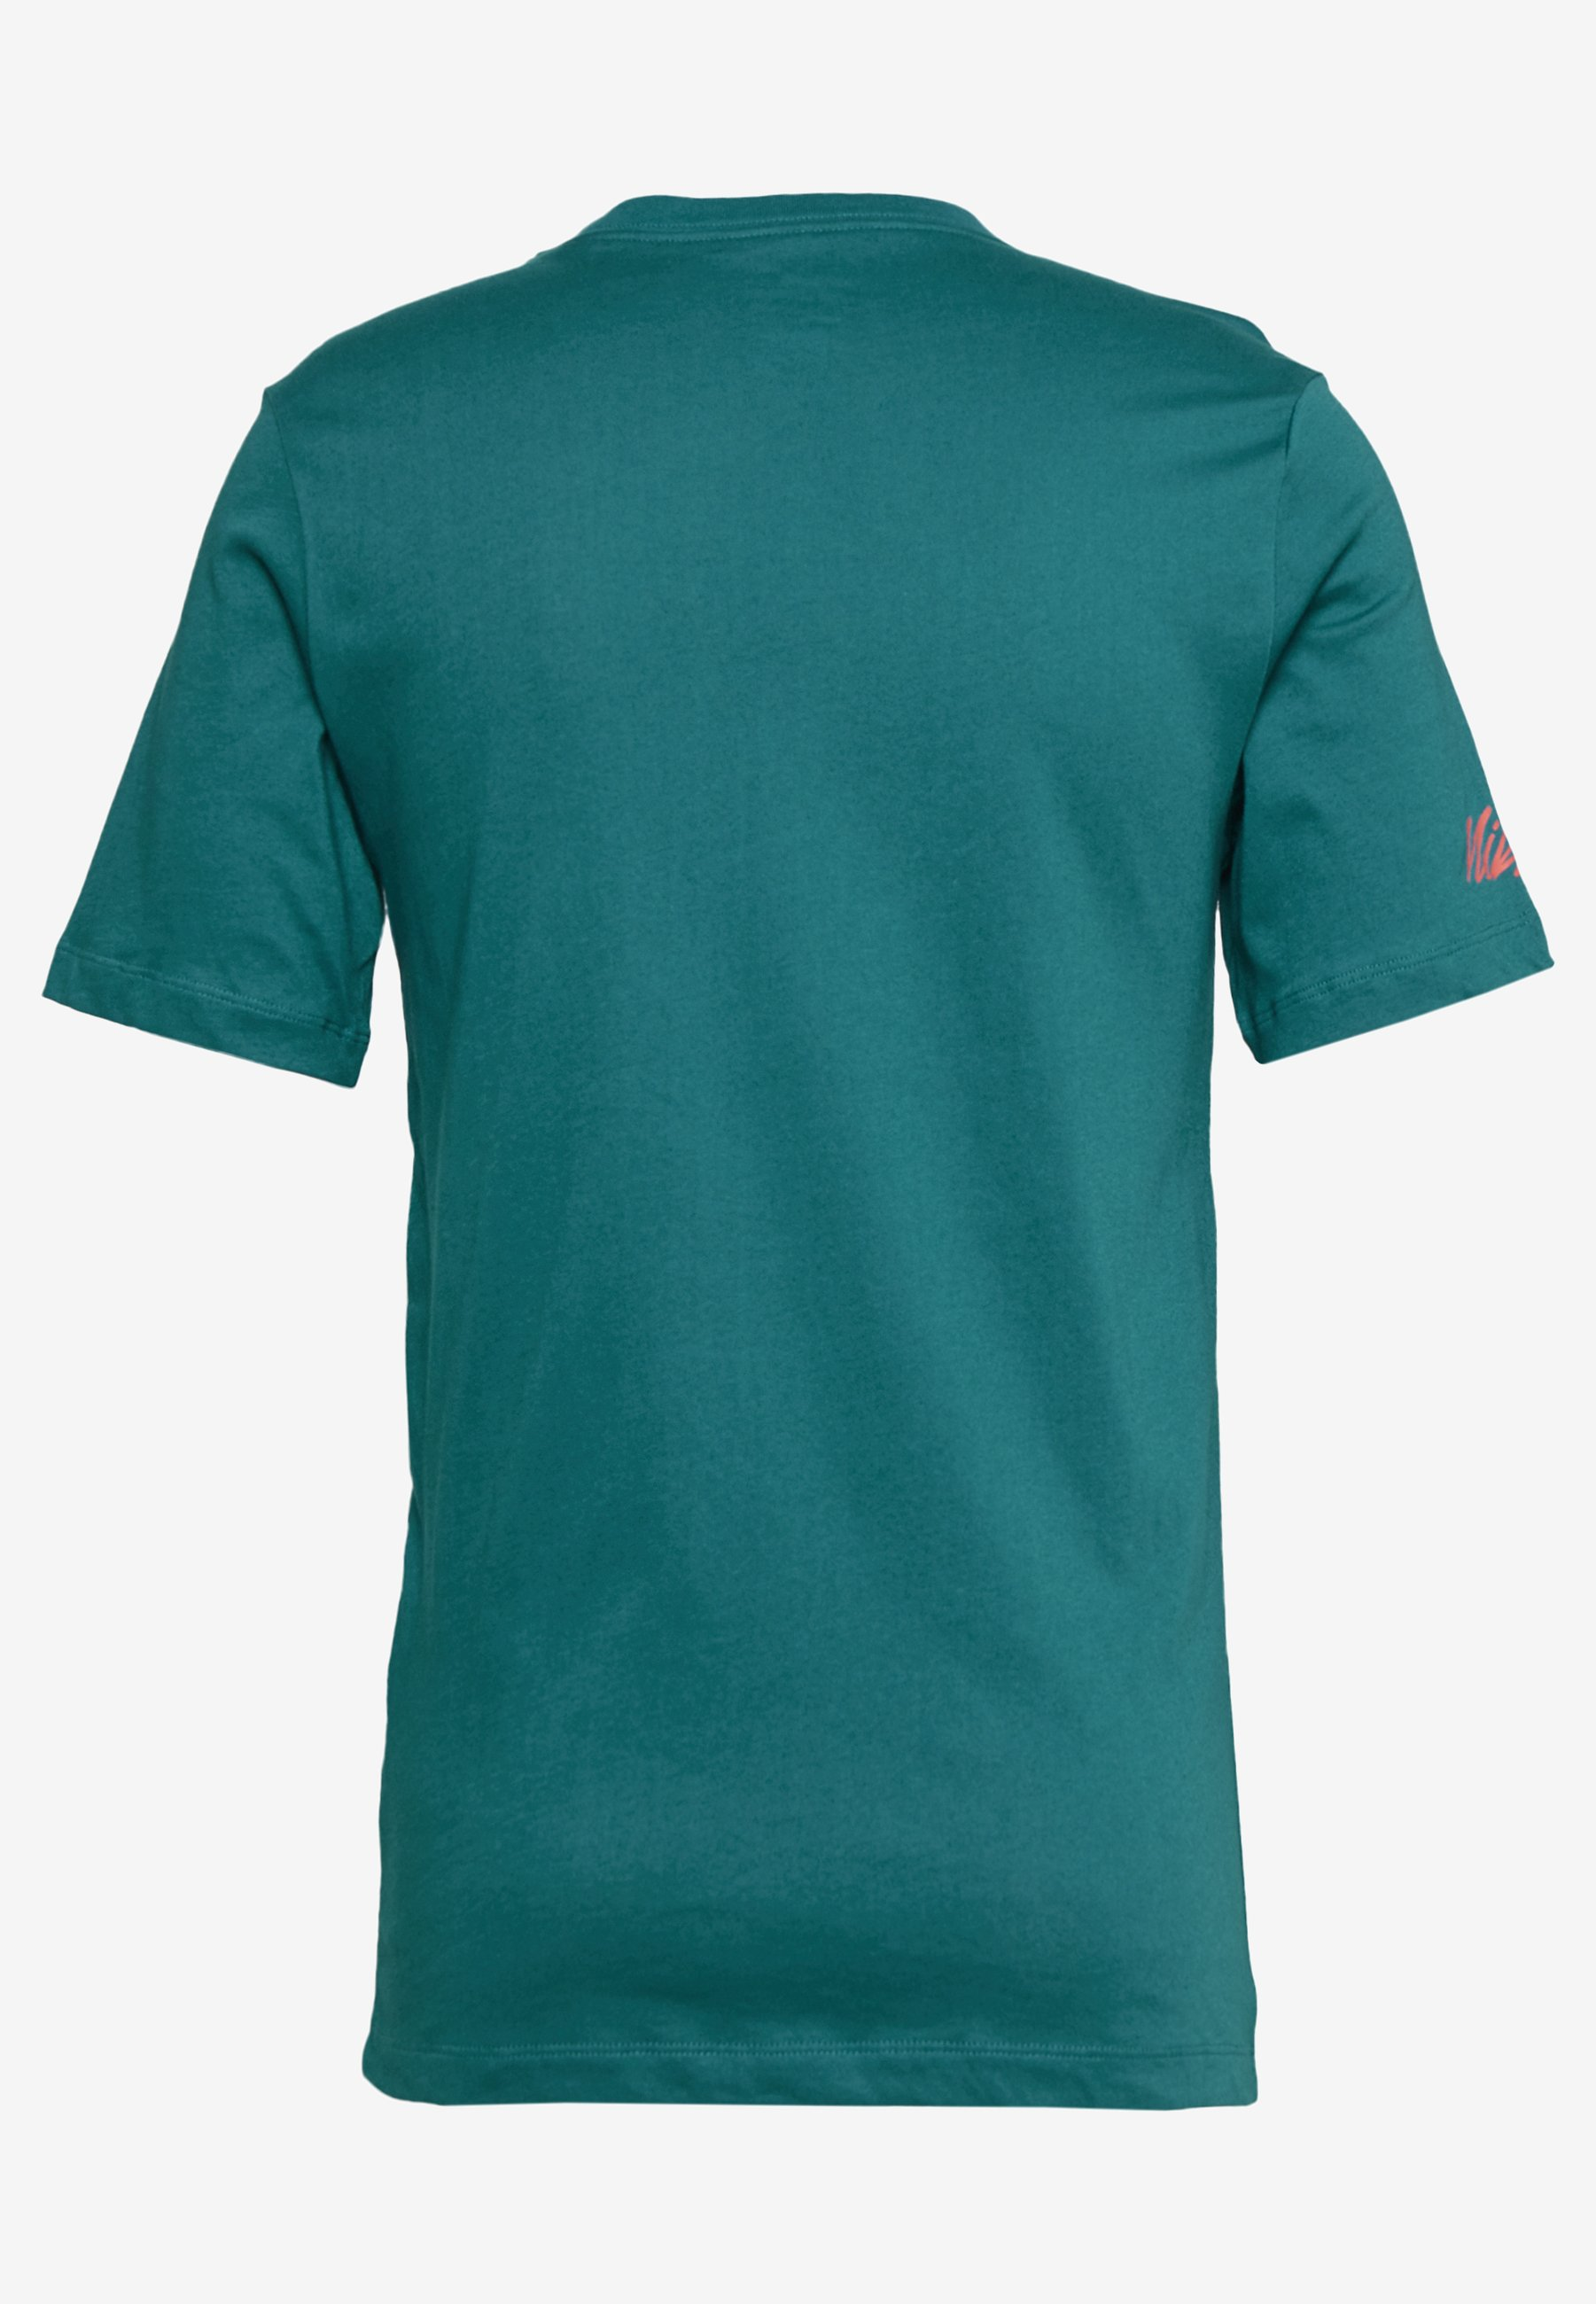 TEE PROJECT T shirt imprimé bright spruce